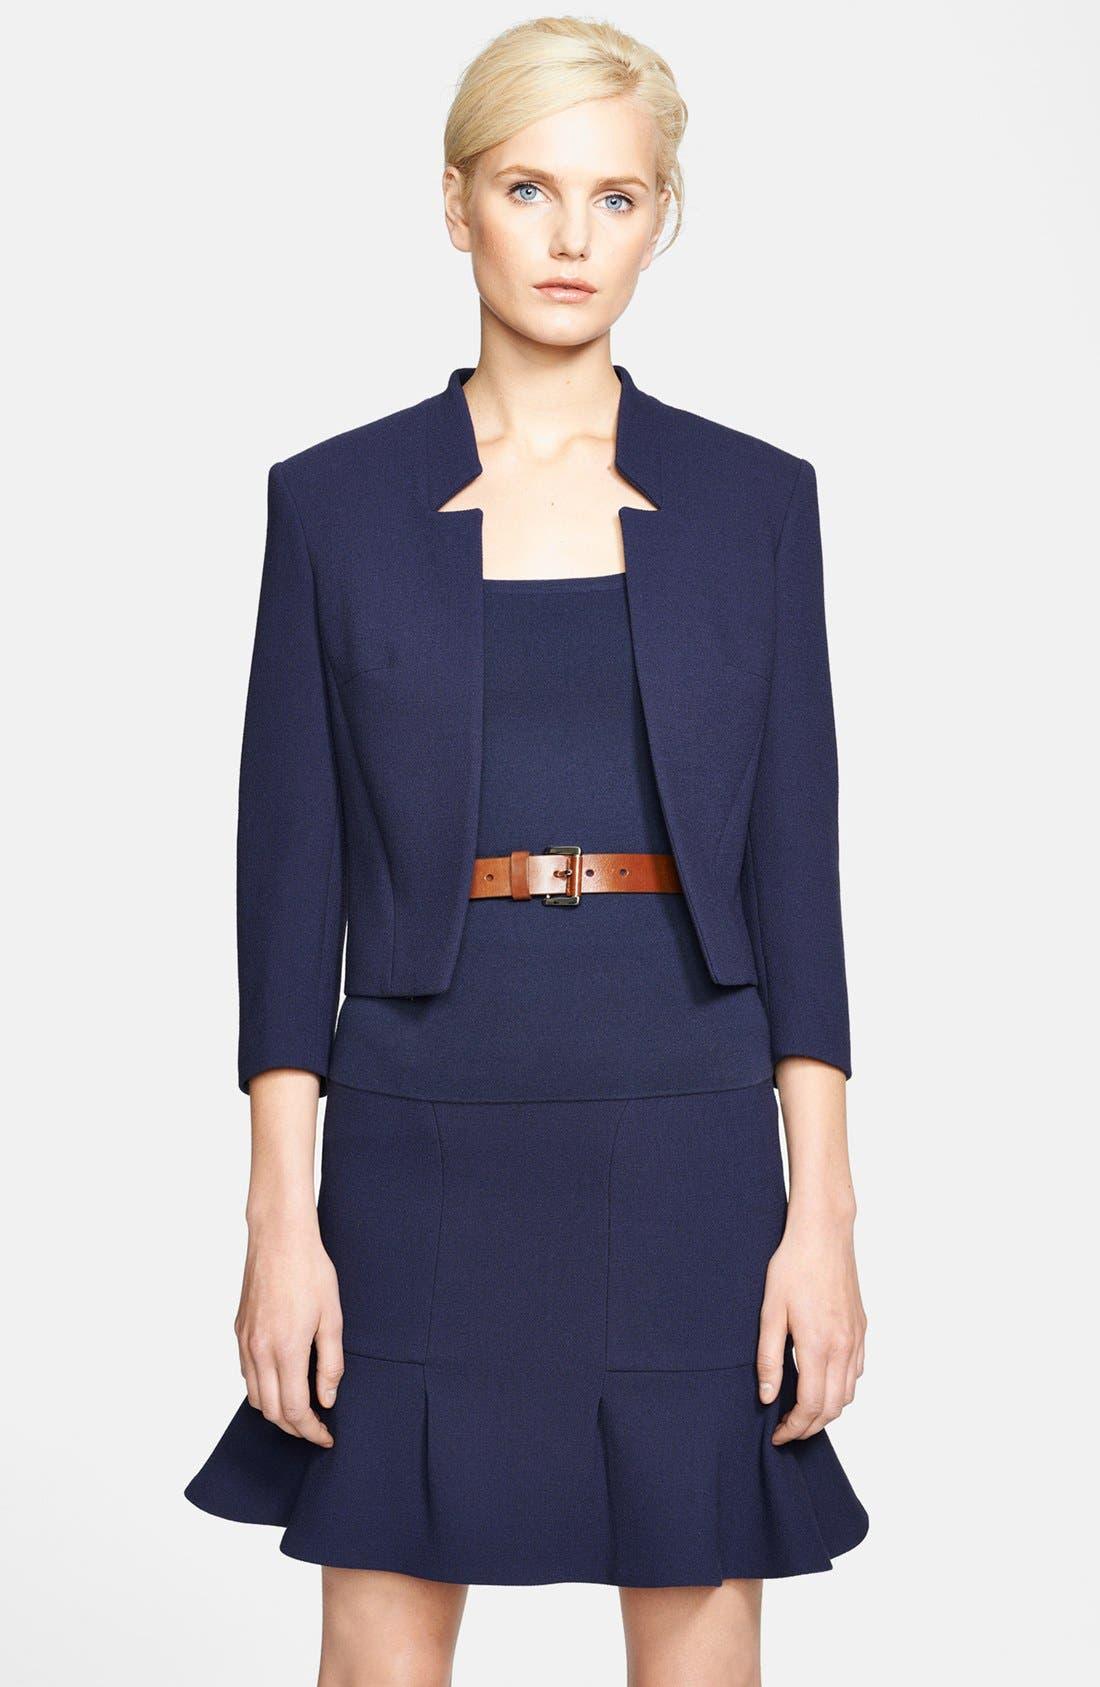 Alternate Image 1 Selected - Michael Kors Bouclé Stretch Wool Jacket